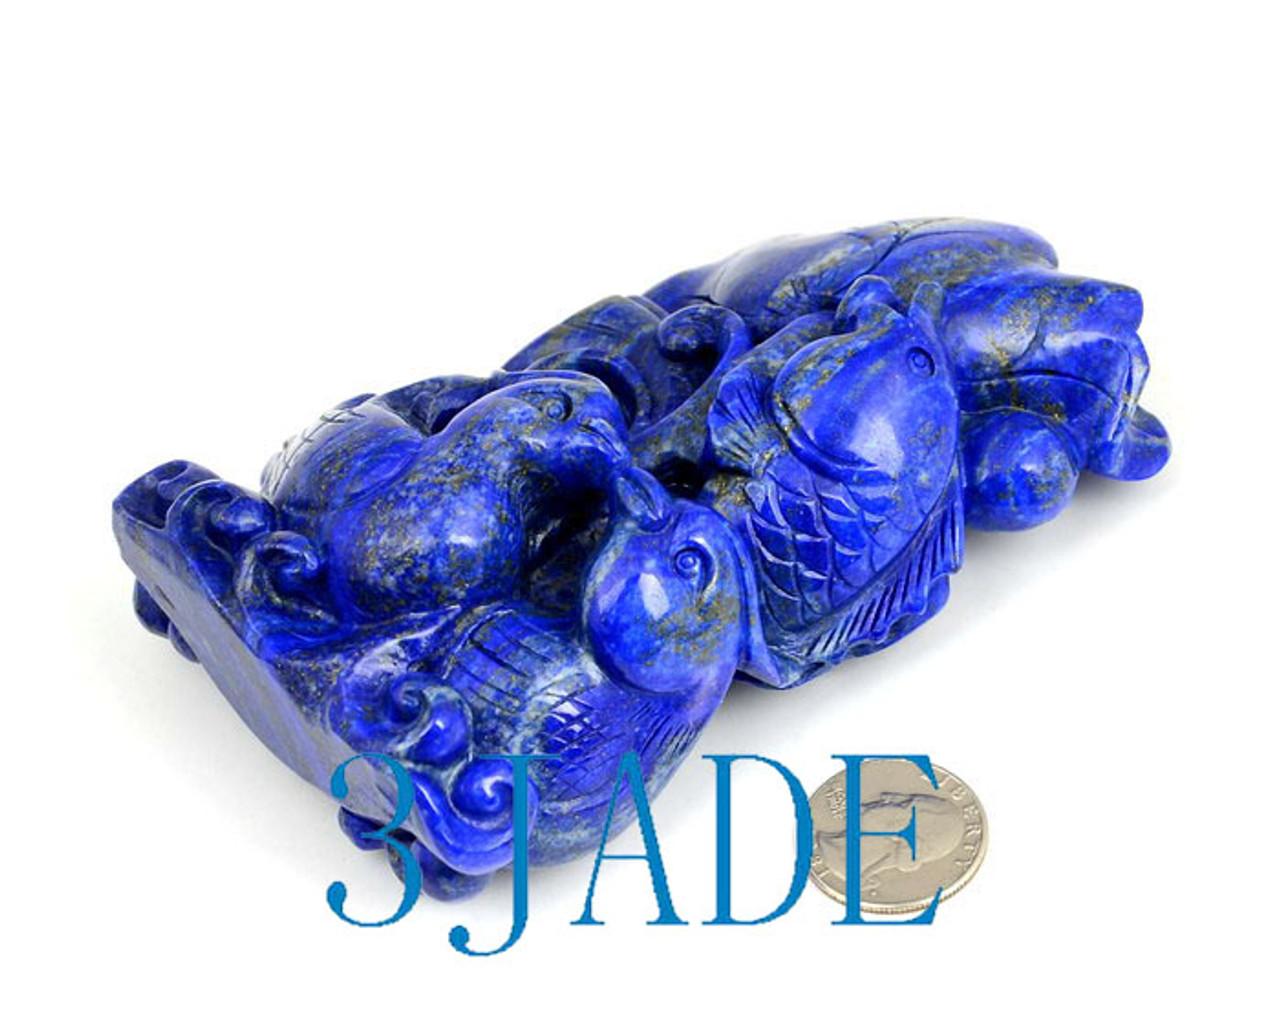 Lapis Lazuli Koi Fish Mandarin Duck Carving